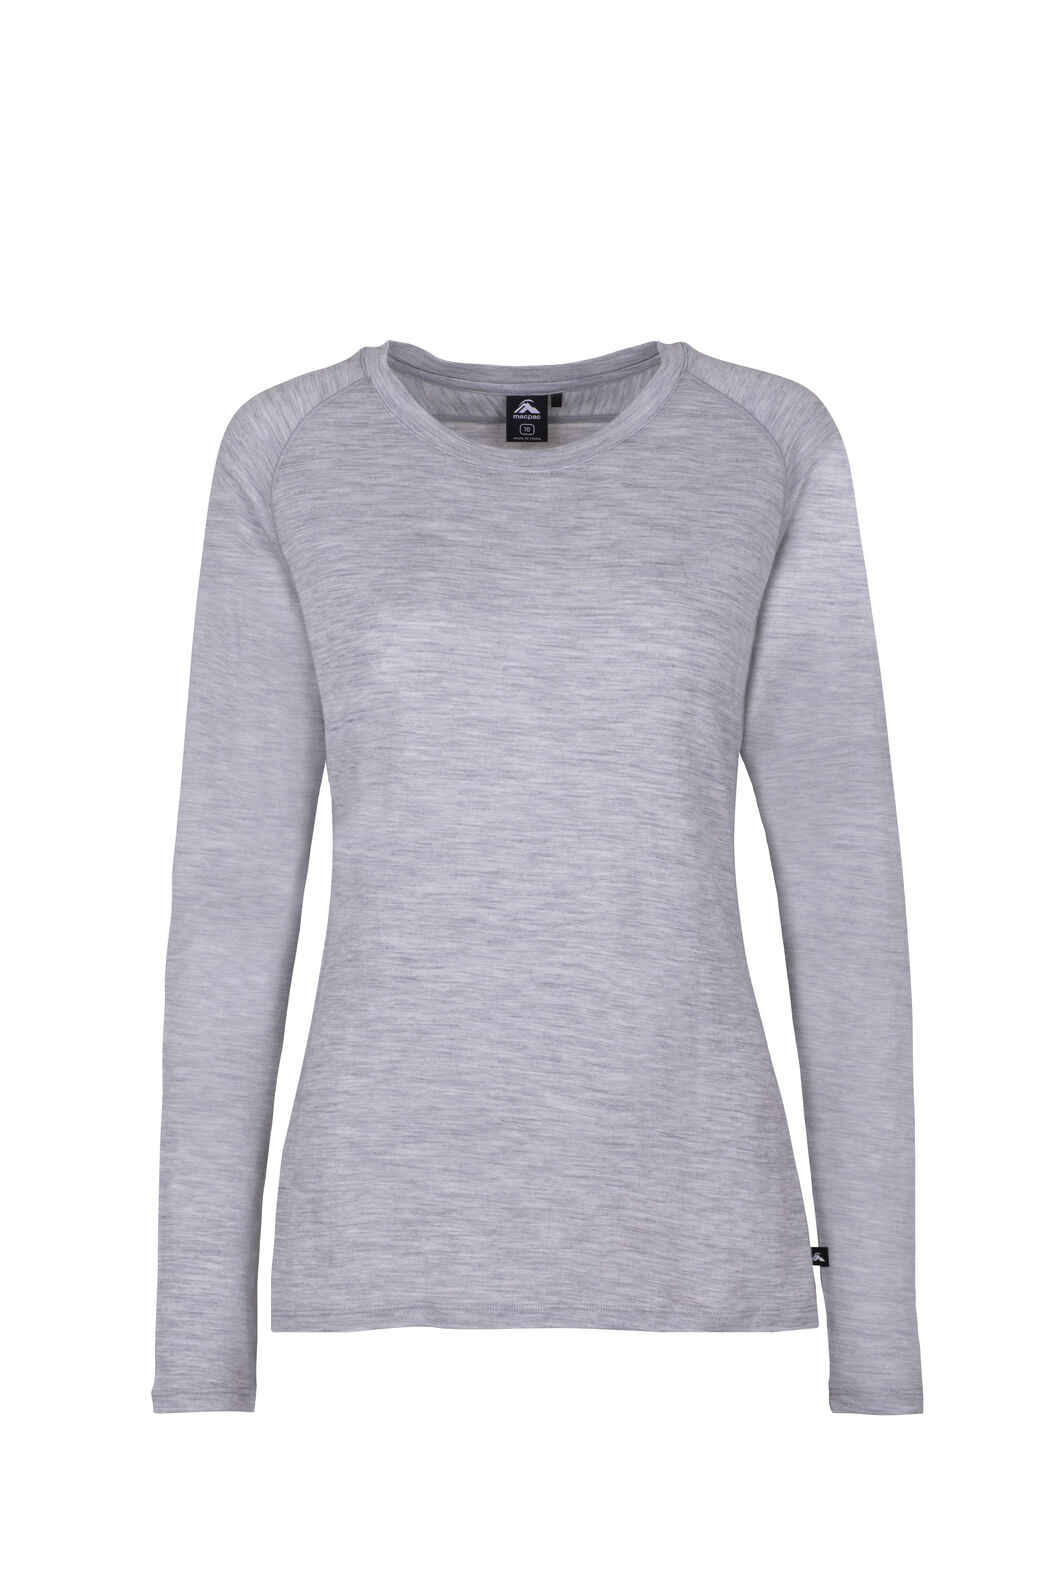 Macpac Meadow Long Sleeve Merino - Women's, Light Grey Marle, hi-res